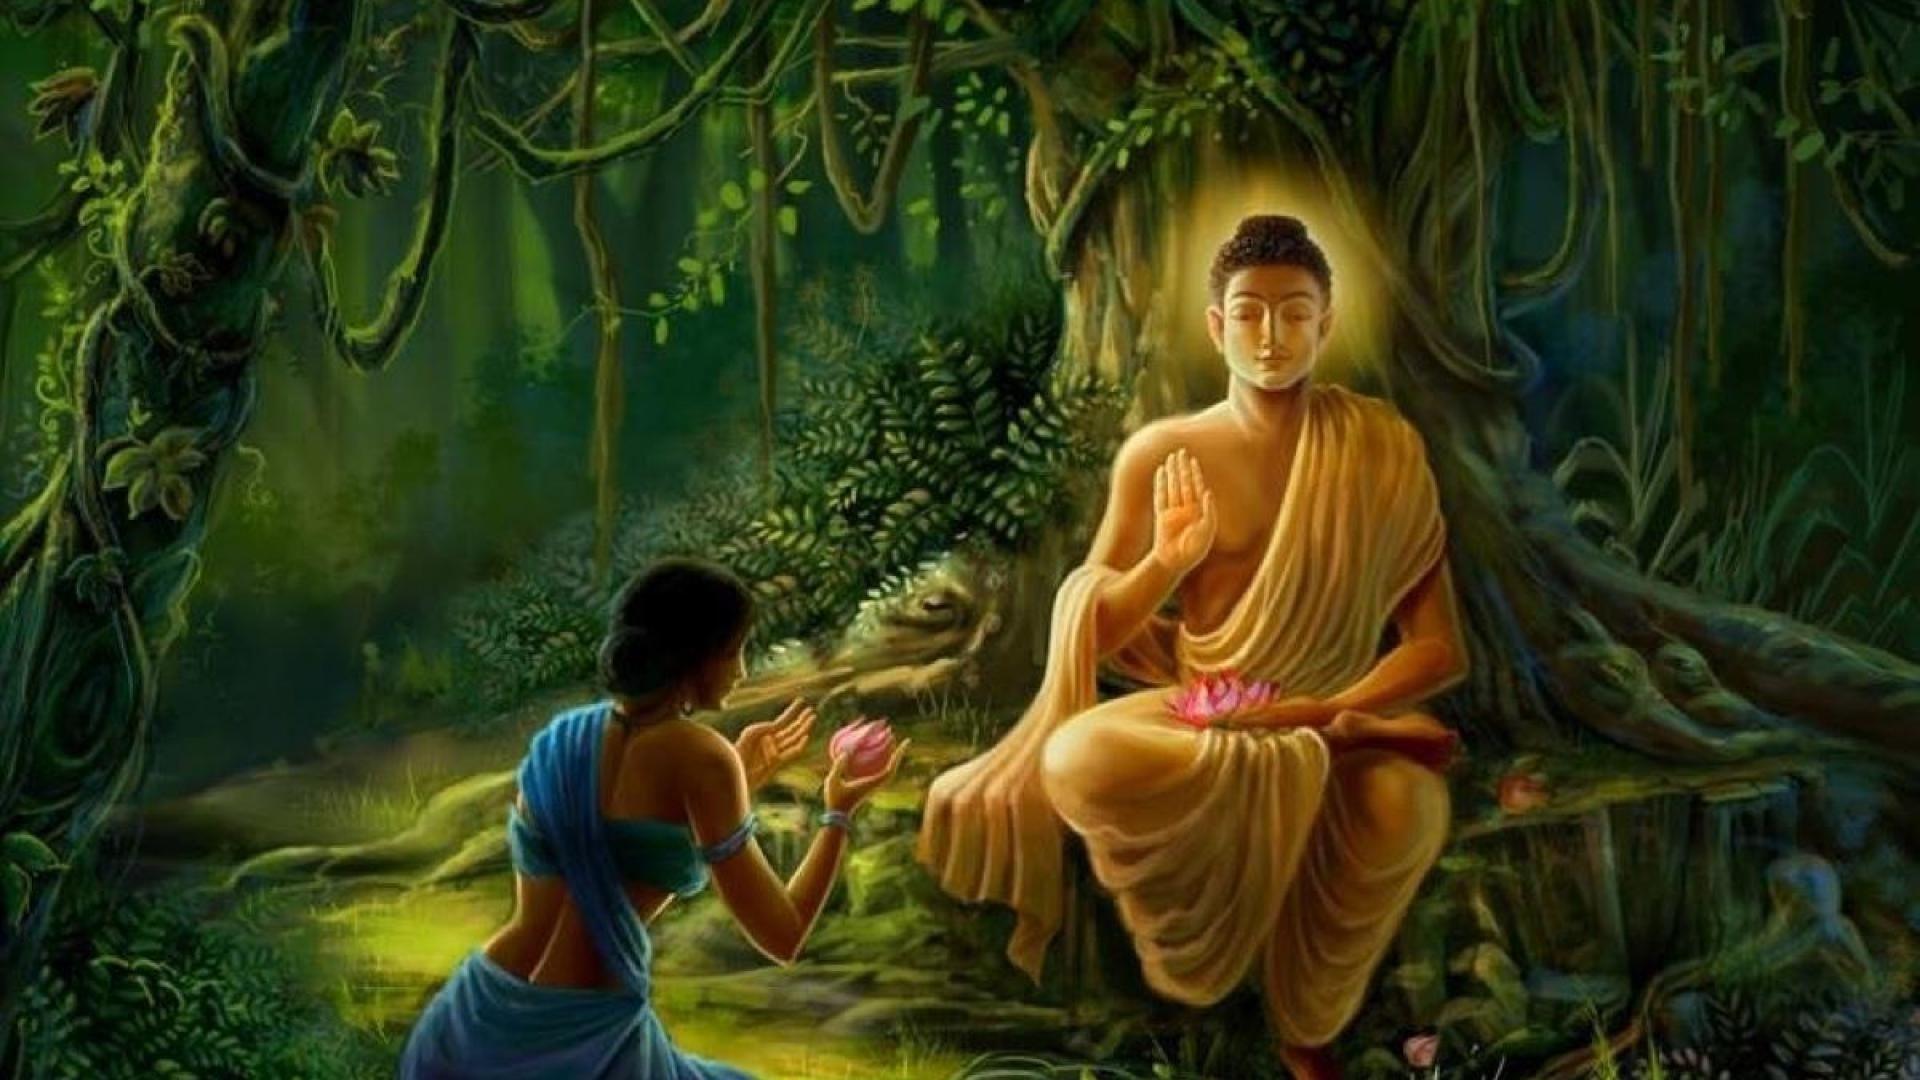 10 Best Buddha Wallpaper Widescreen Hd Full Hd 1080p For Pc Background Buddhism Buddha Life Buddhism Art